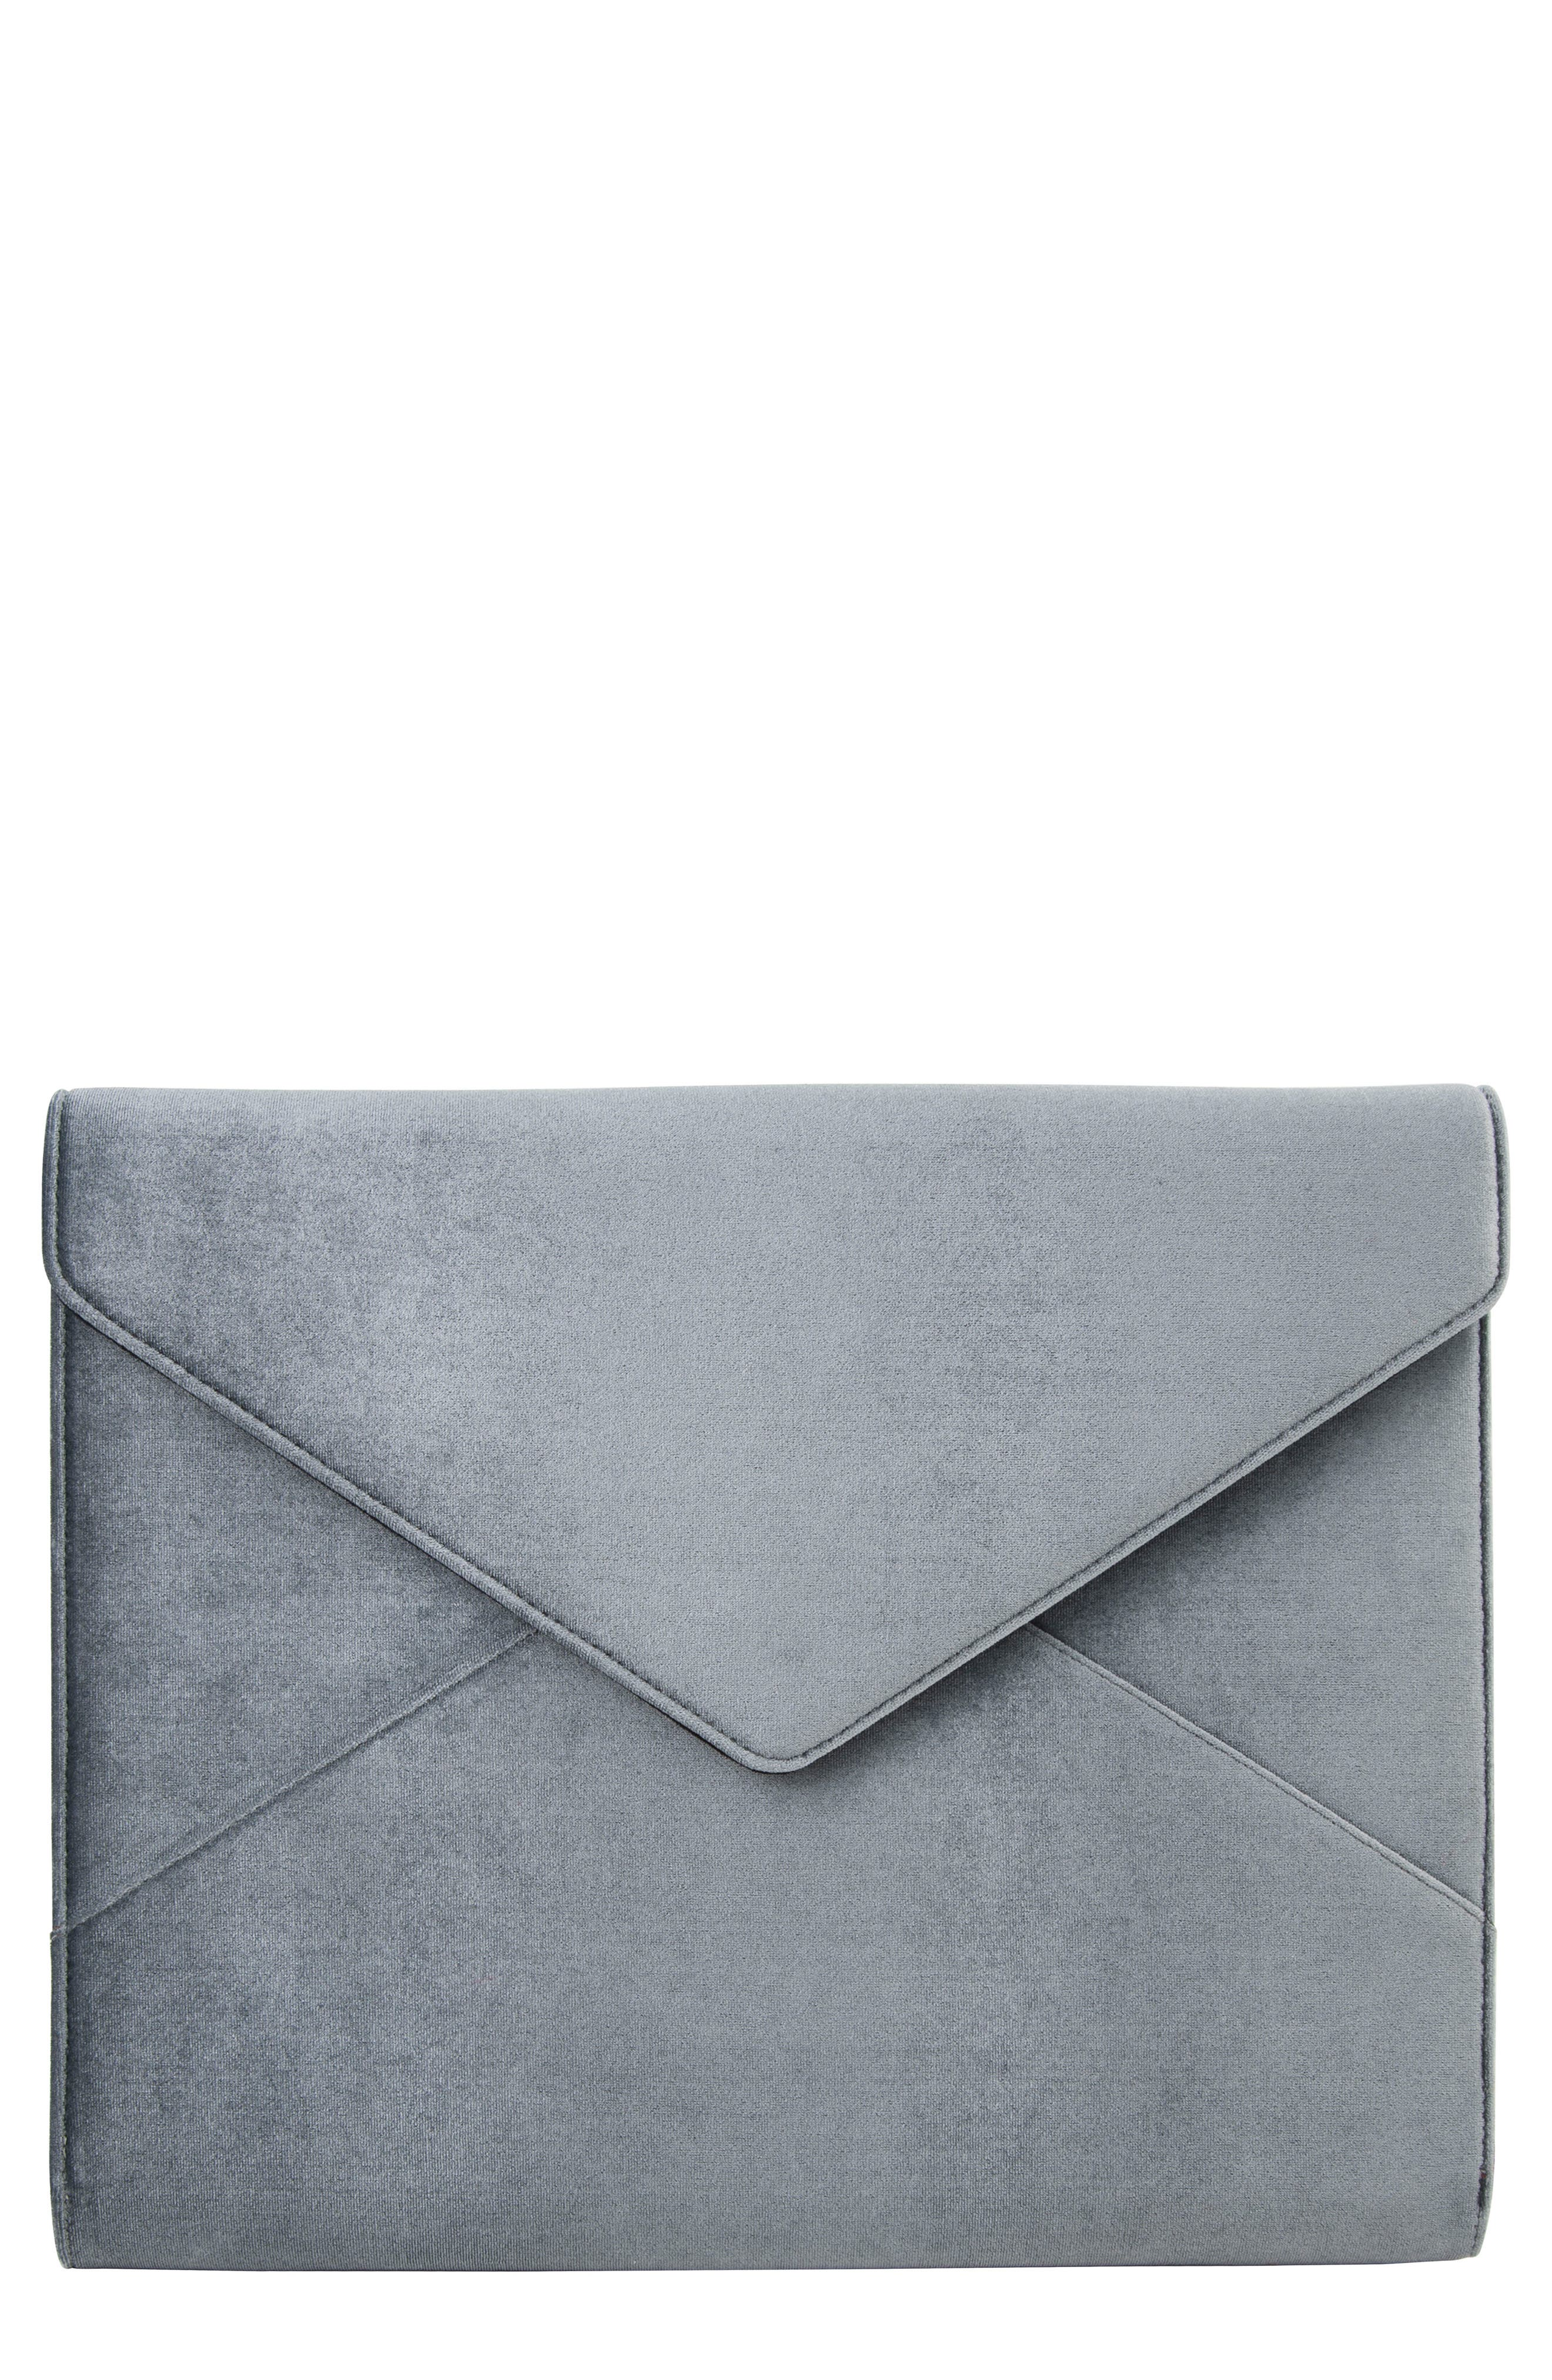 Main Image - Sonix Powder Velvet Laptop Clutch